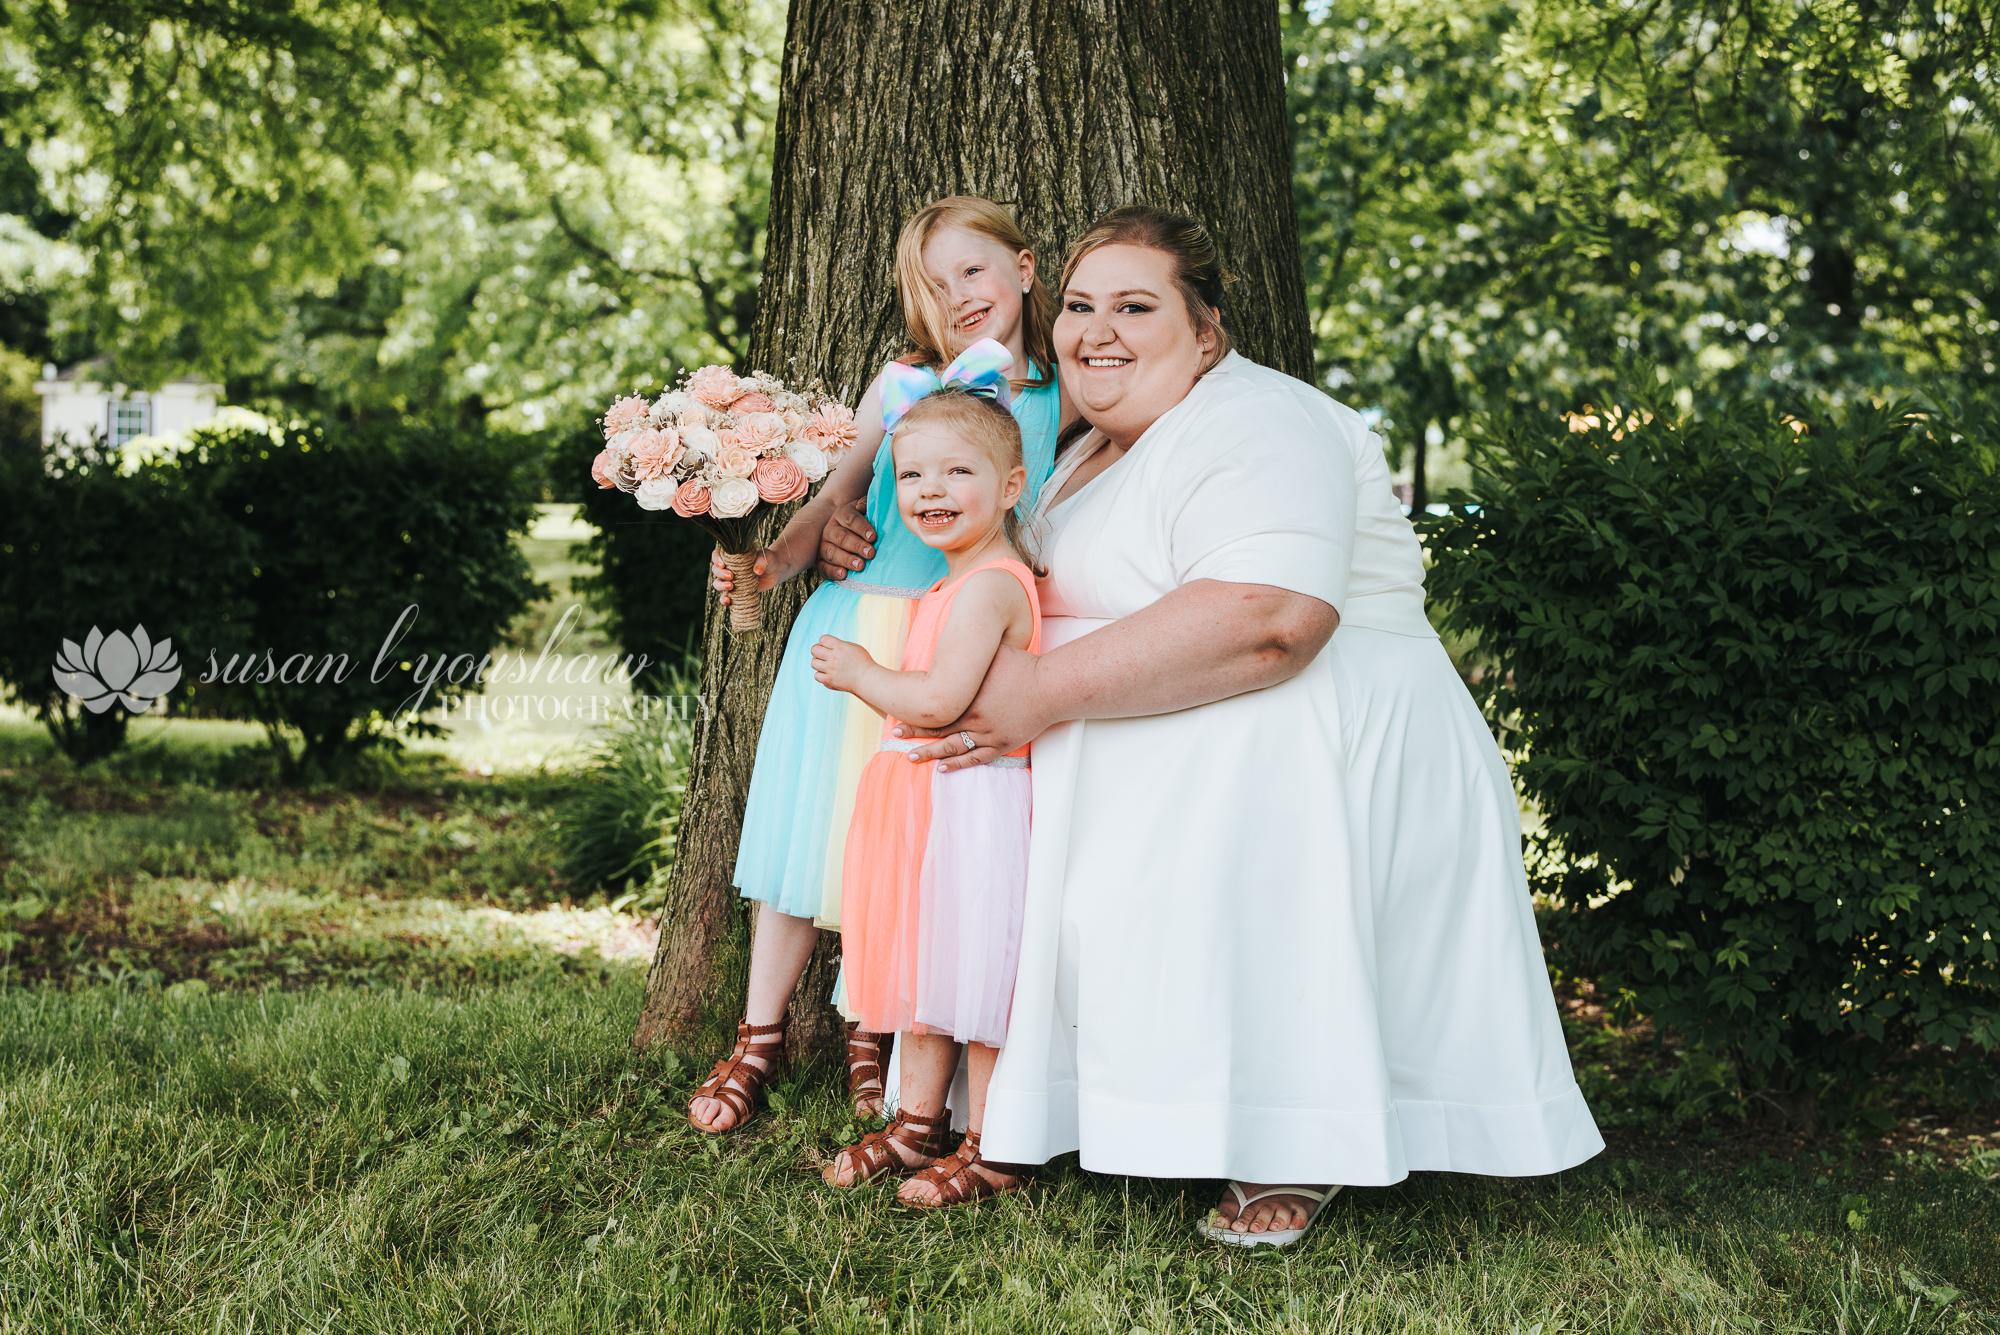 Bill and Sarah Wedding Photos 06-08-2019 SLY Photography -45.jpg